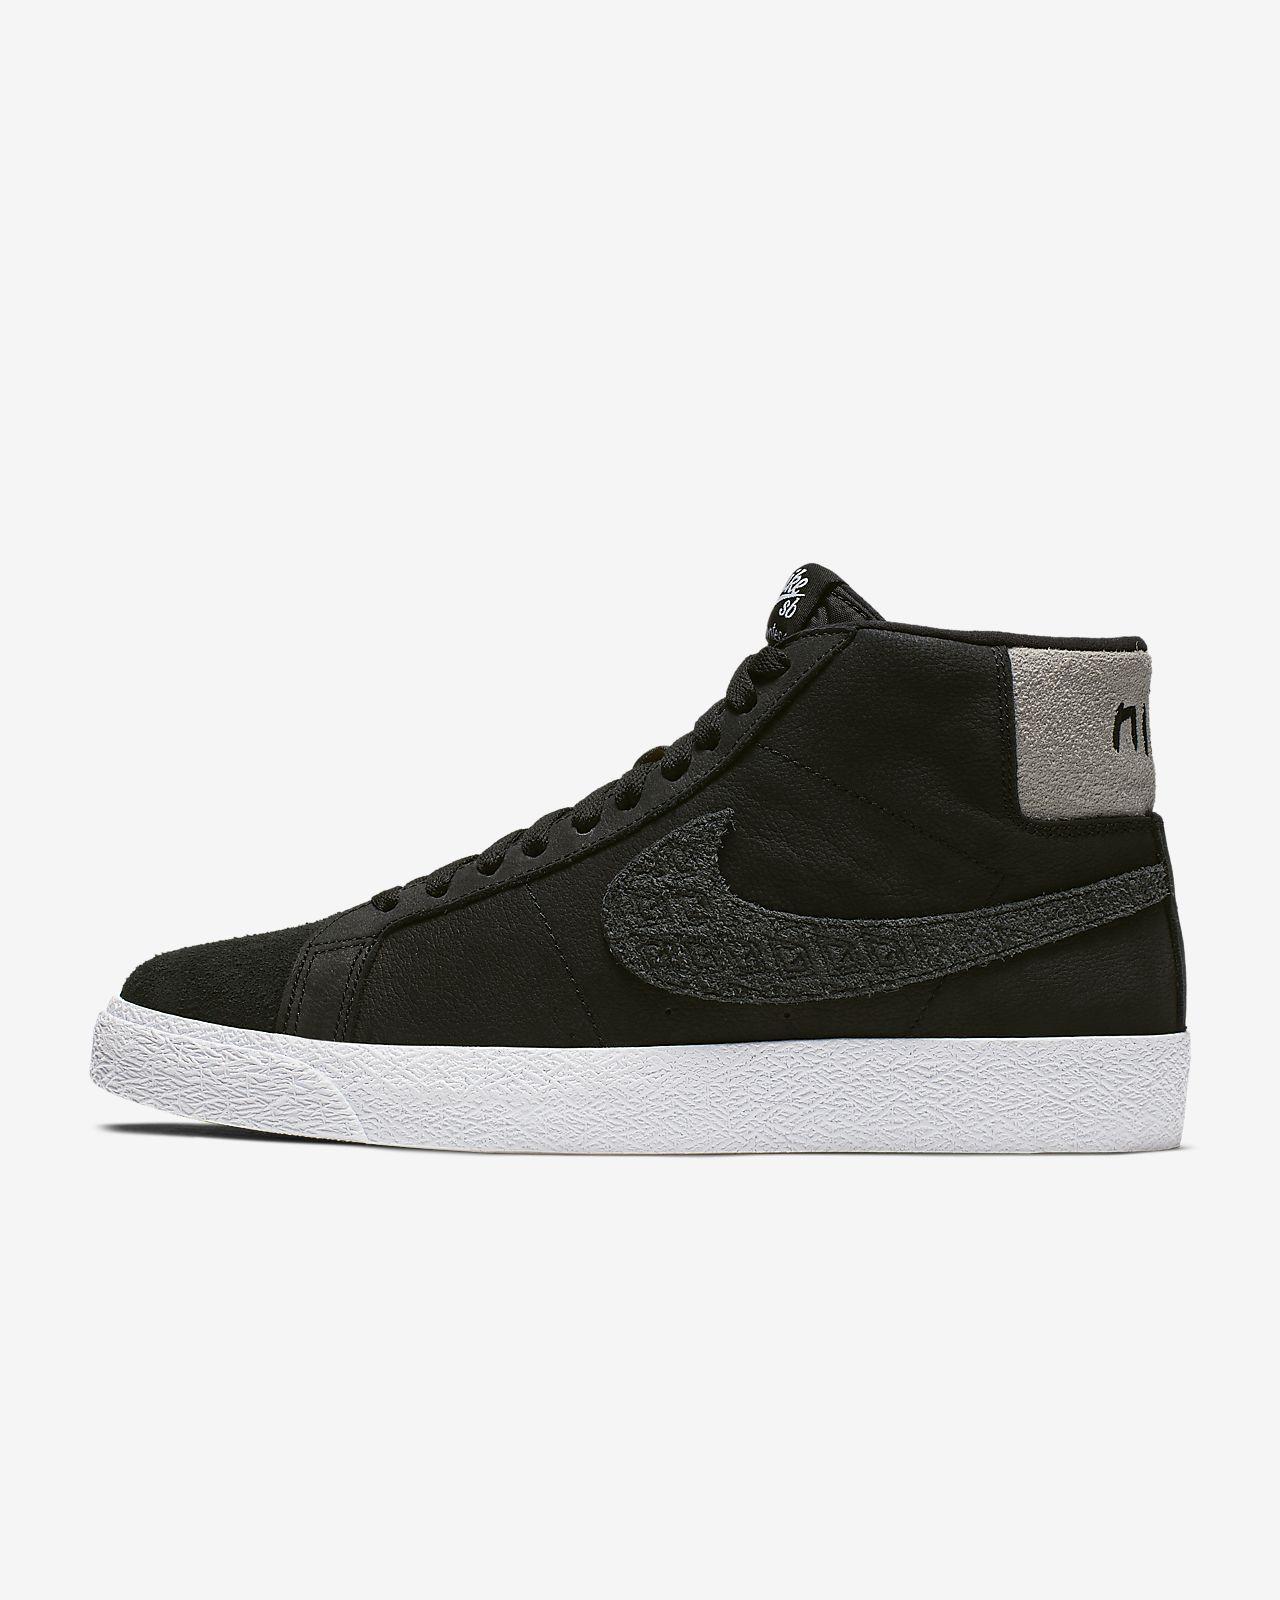 7e791e5f41b7 Nike SB Zoom Blazer Mid Skateboardschuh